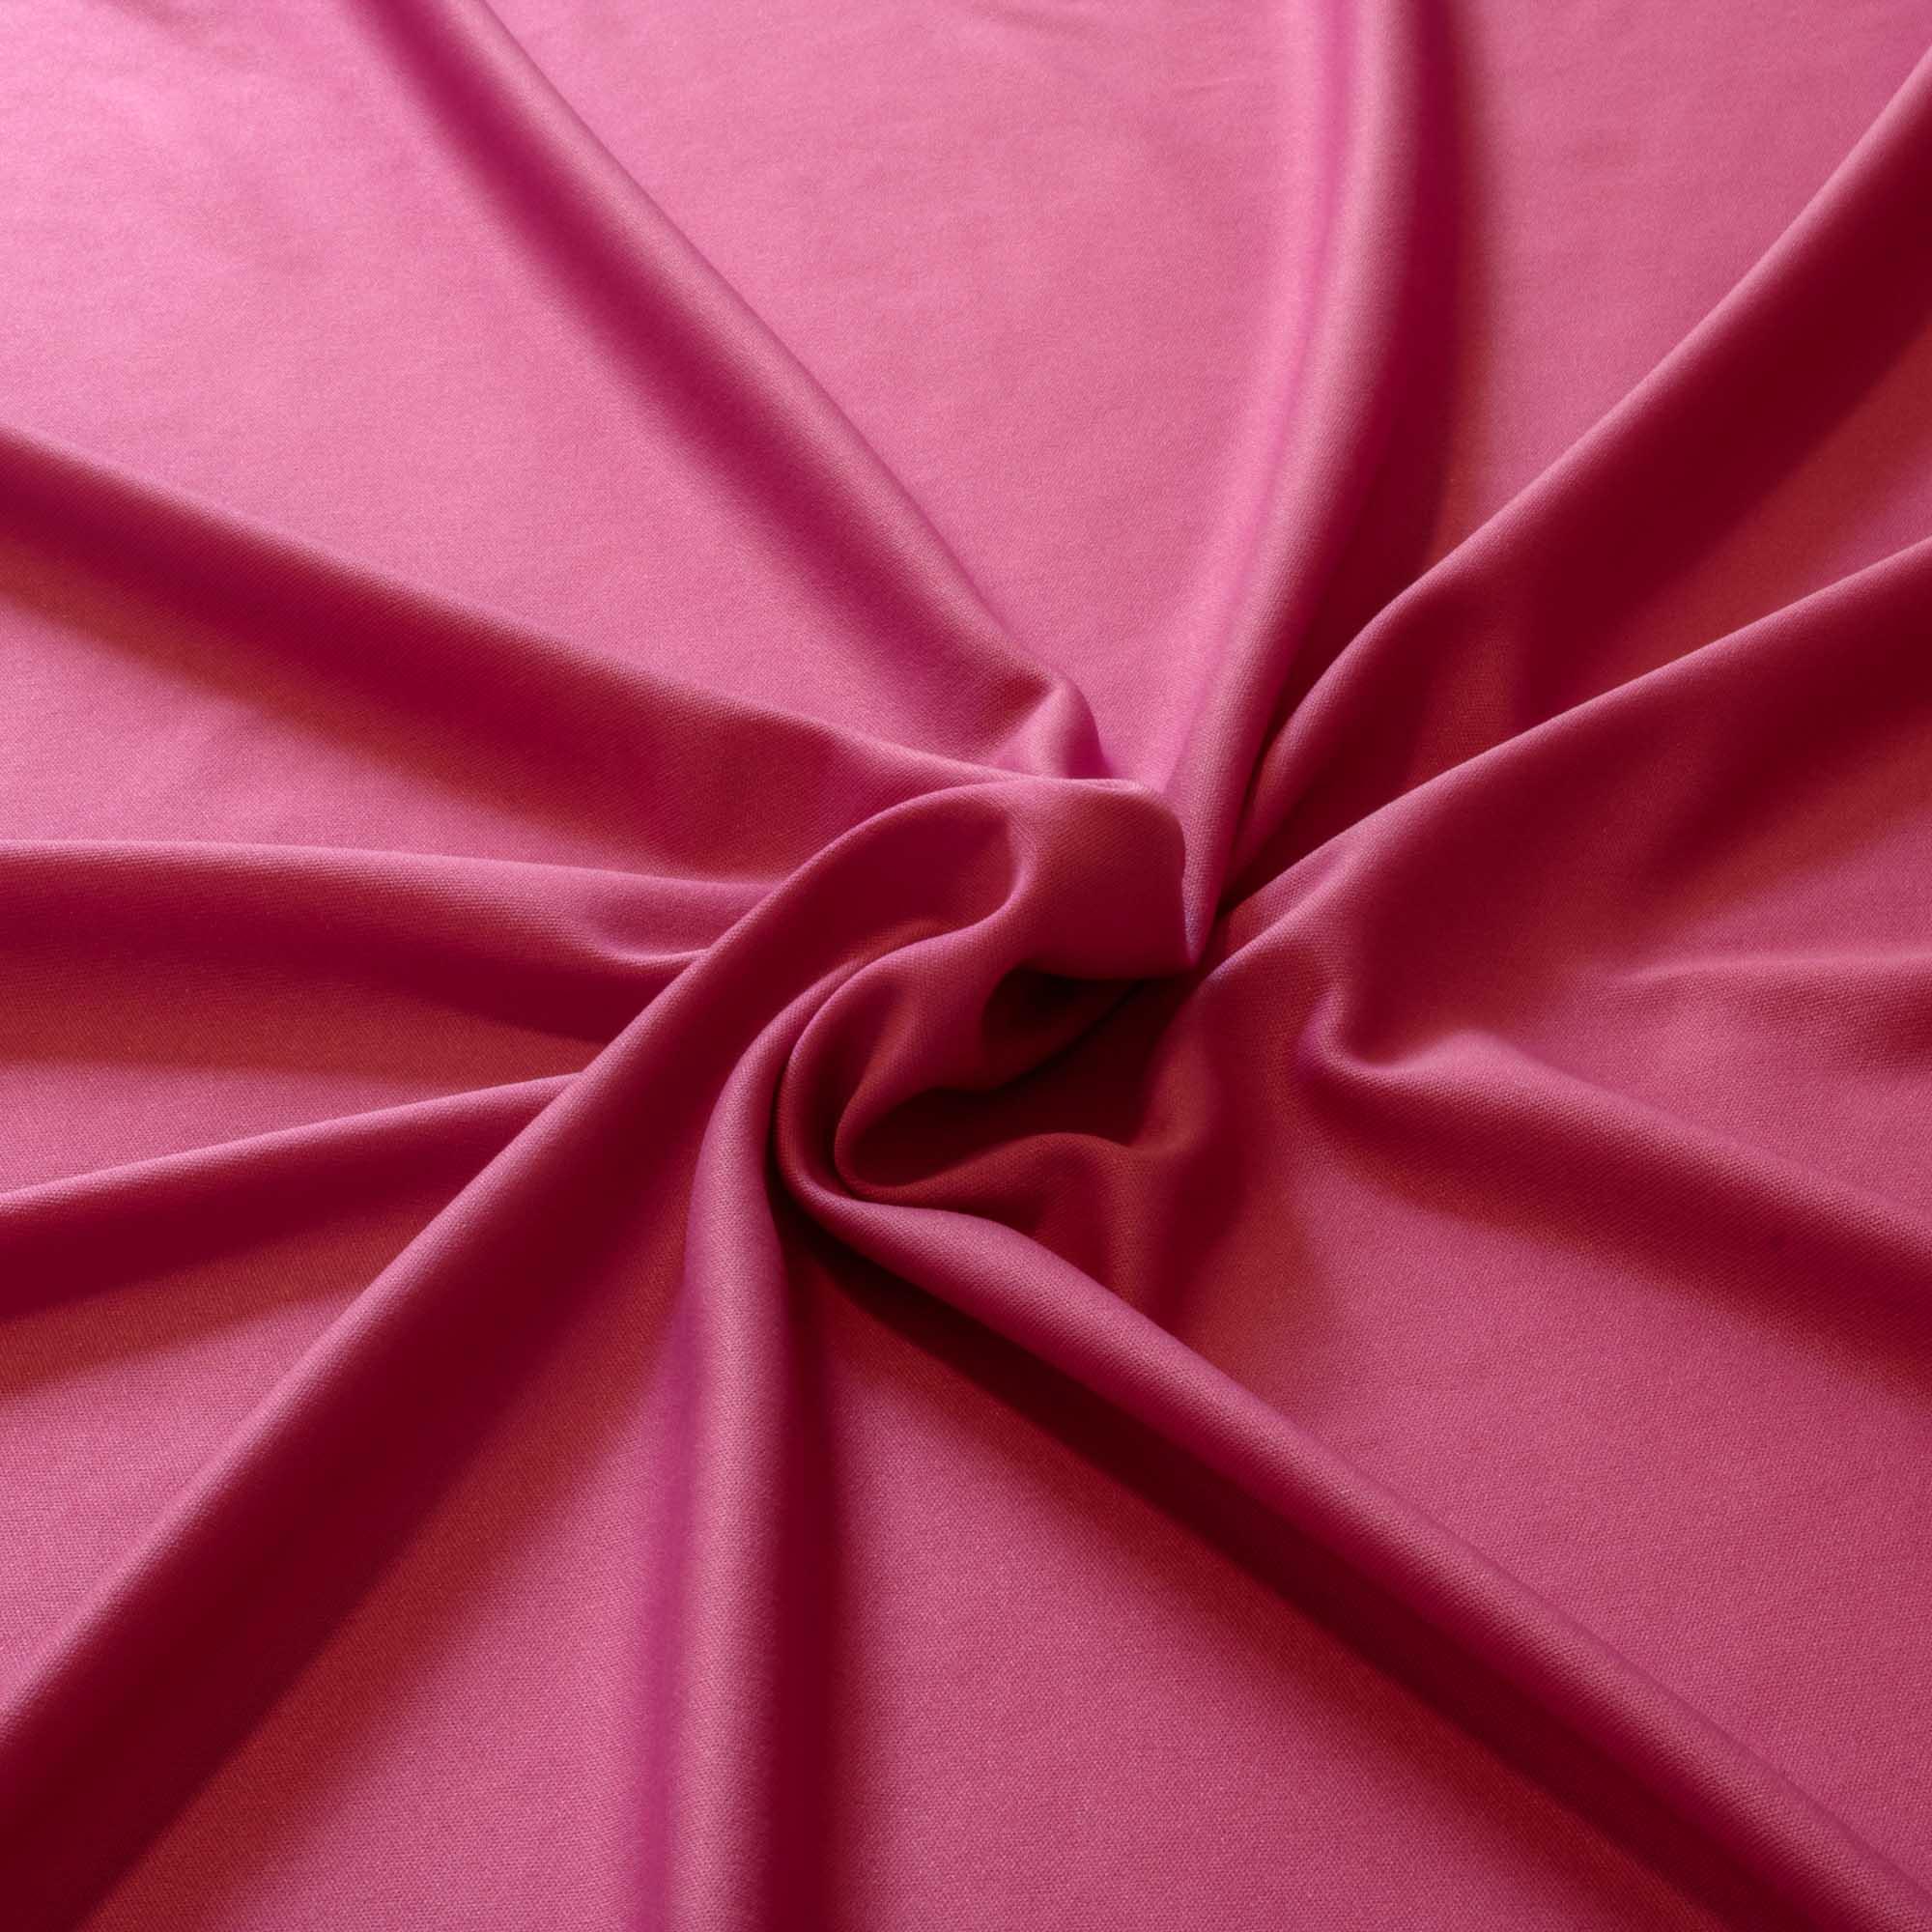 Tecido Malha Helanca Light Rose 100% Poliester 1,80 mt Largura